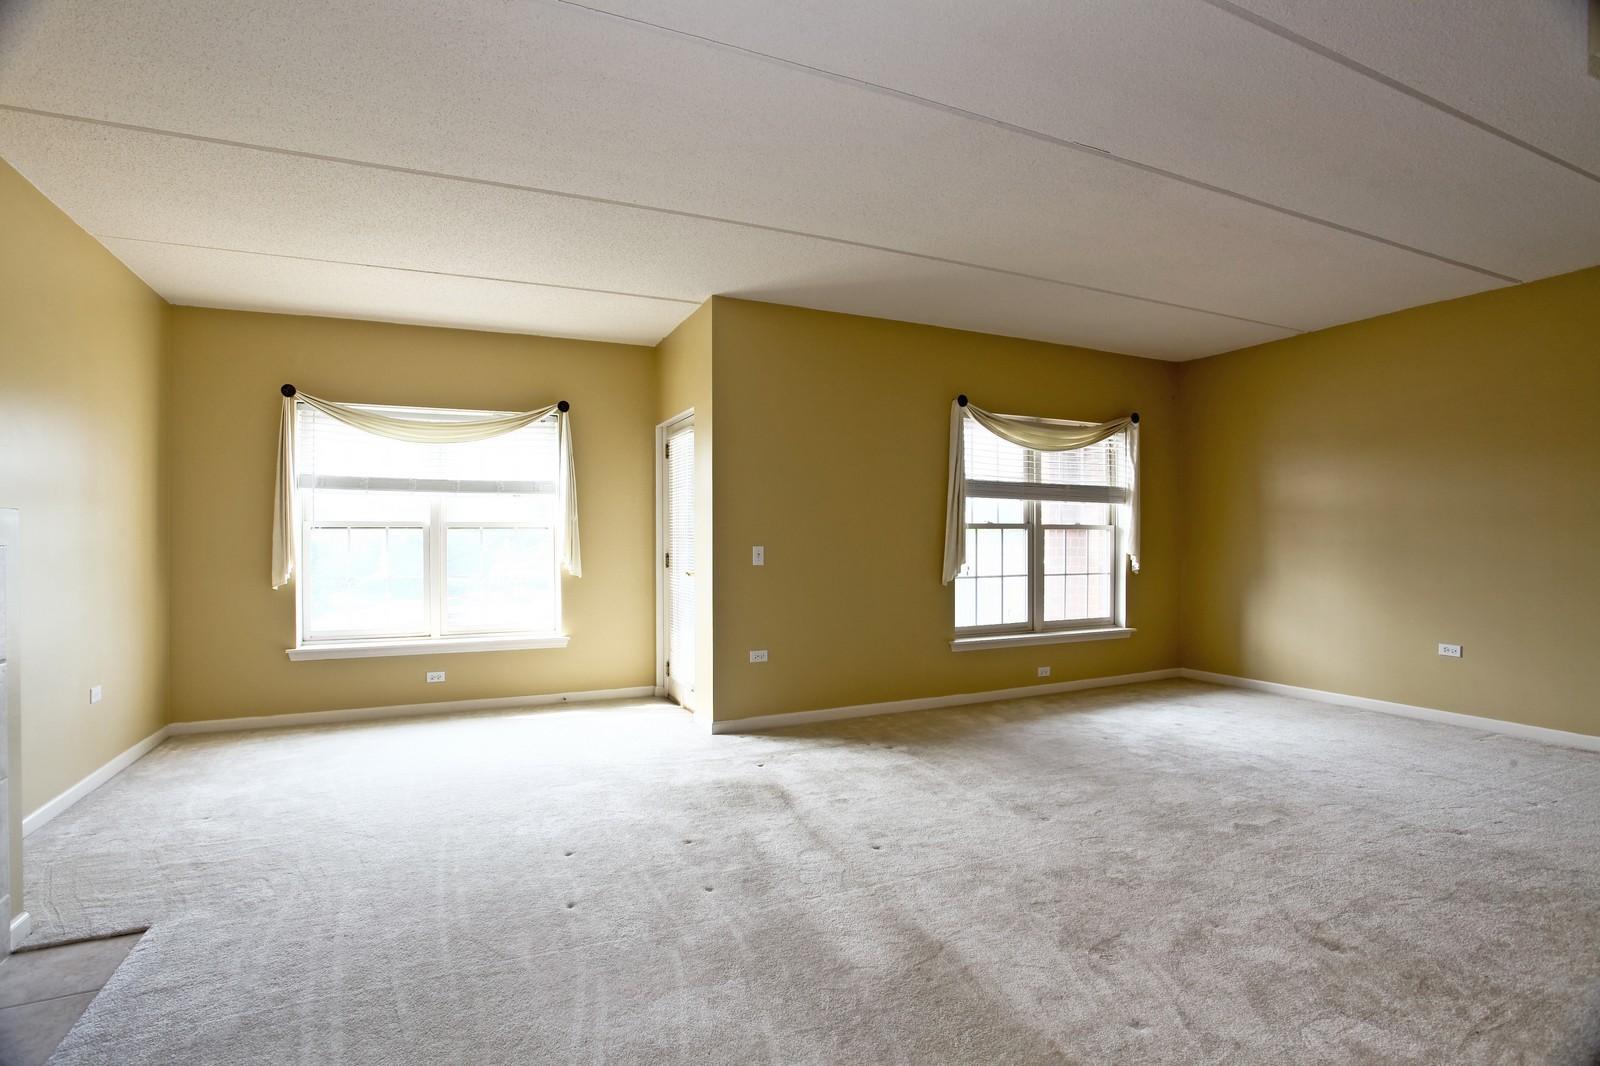 Real Estate Photography - 570 Crescent Blvd., 301, Glen Ellyn, IL, 60137 - Living Room